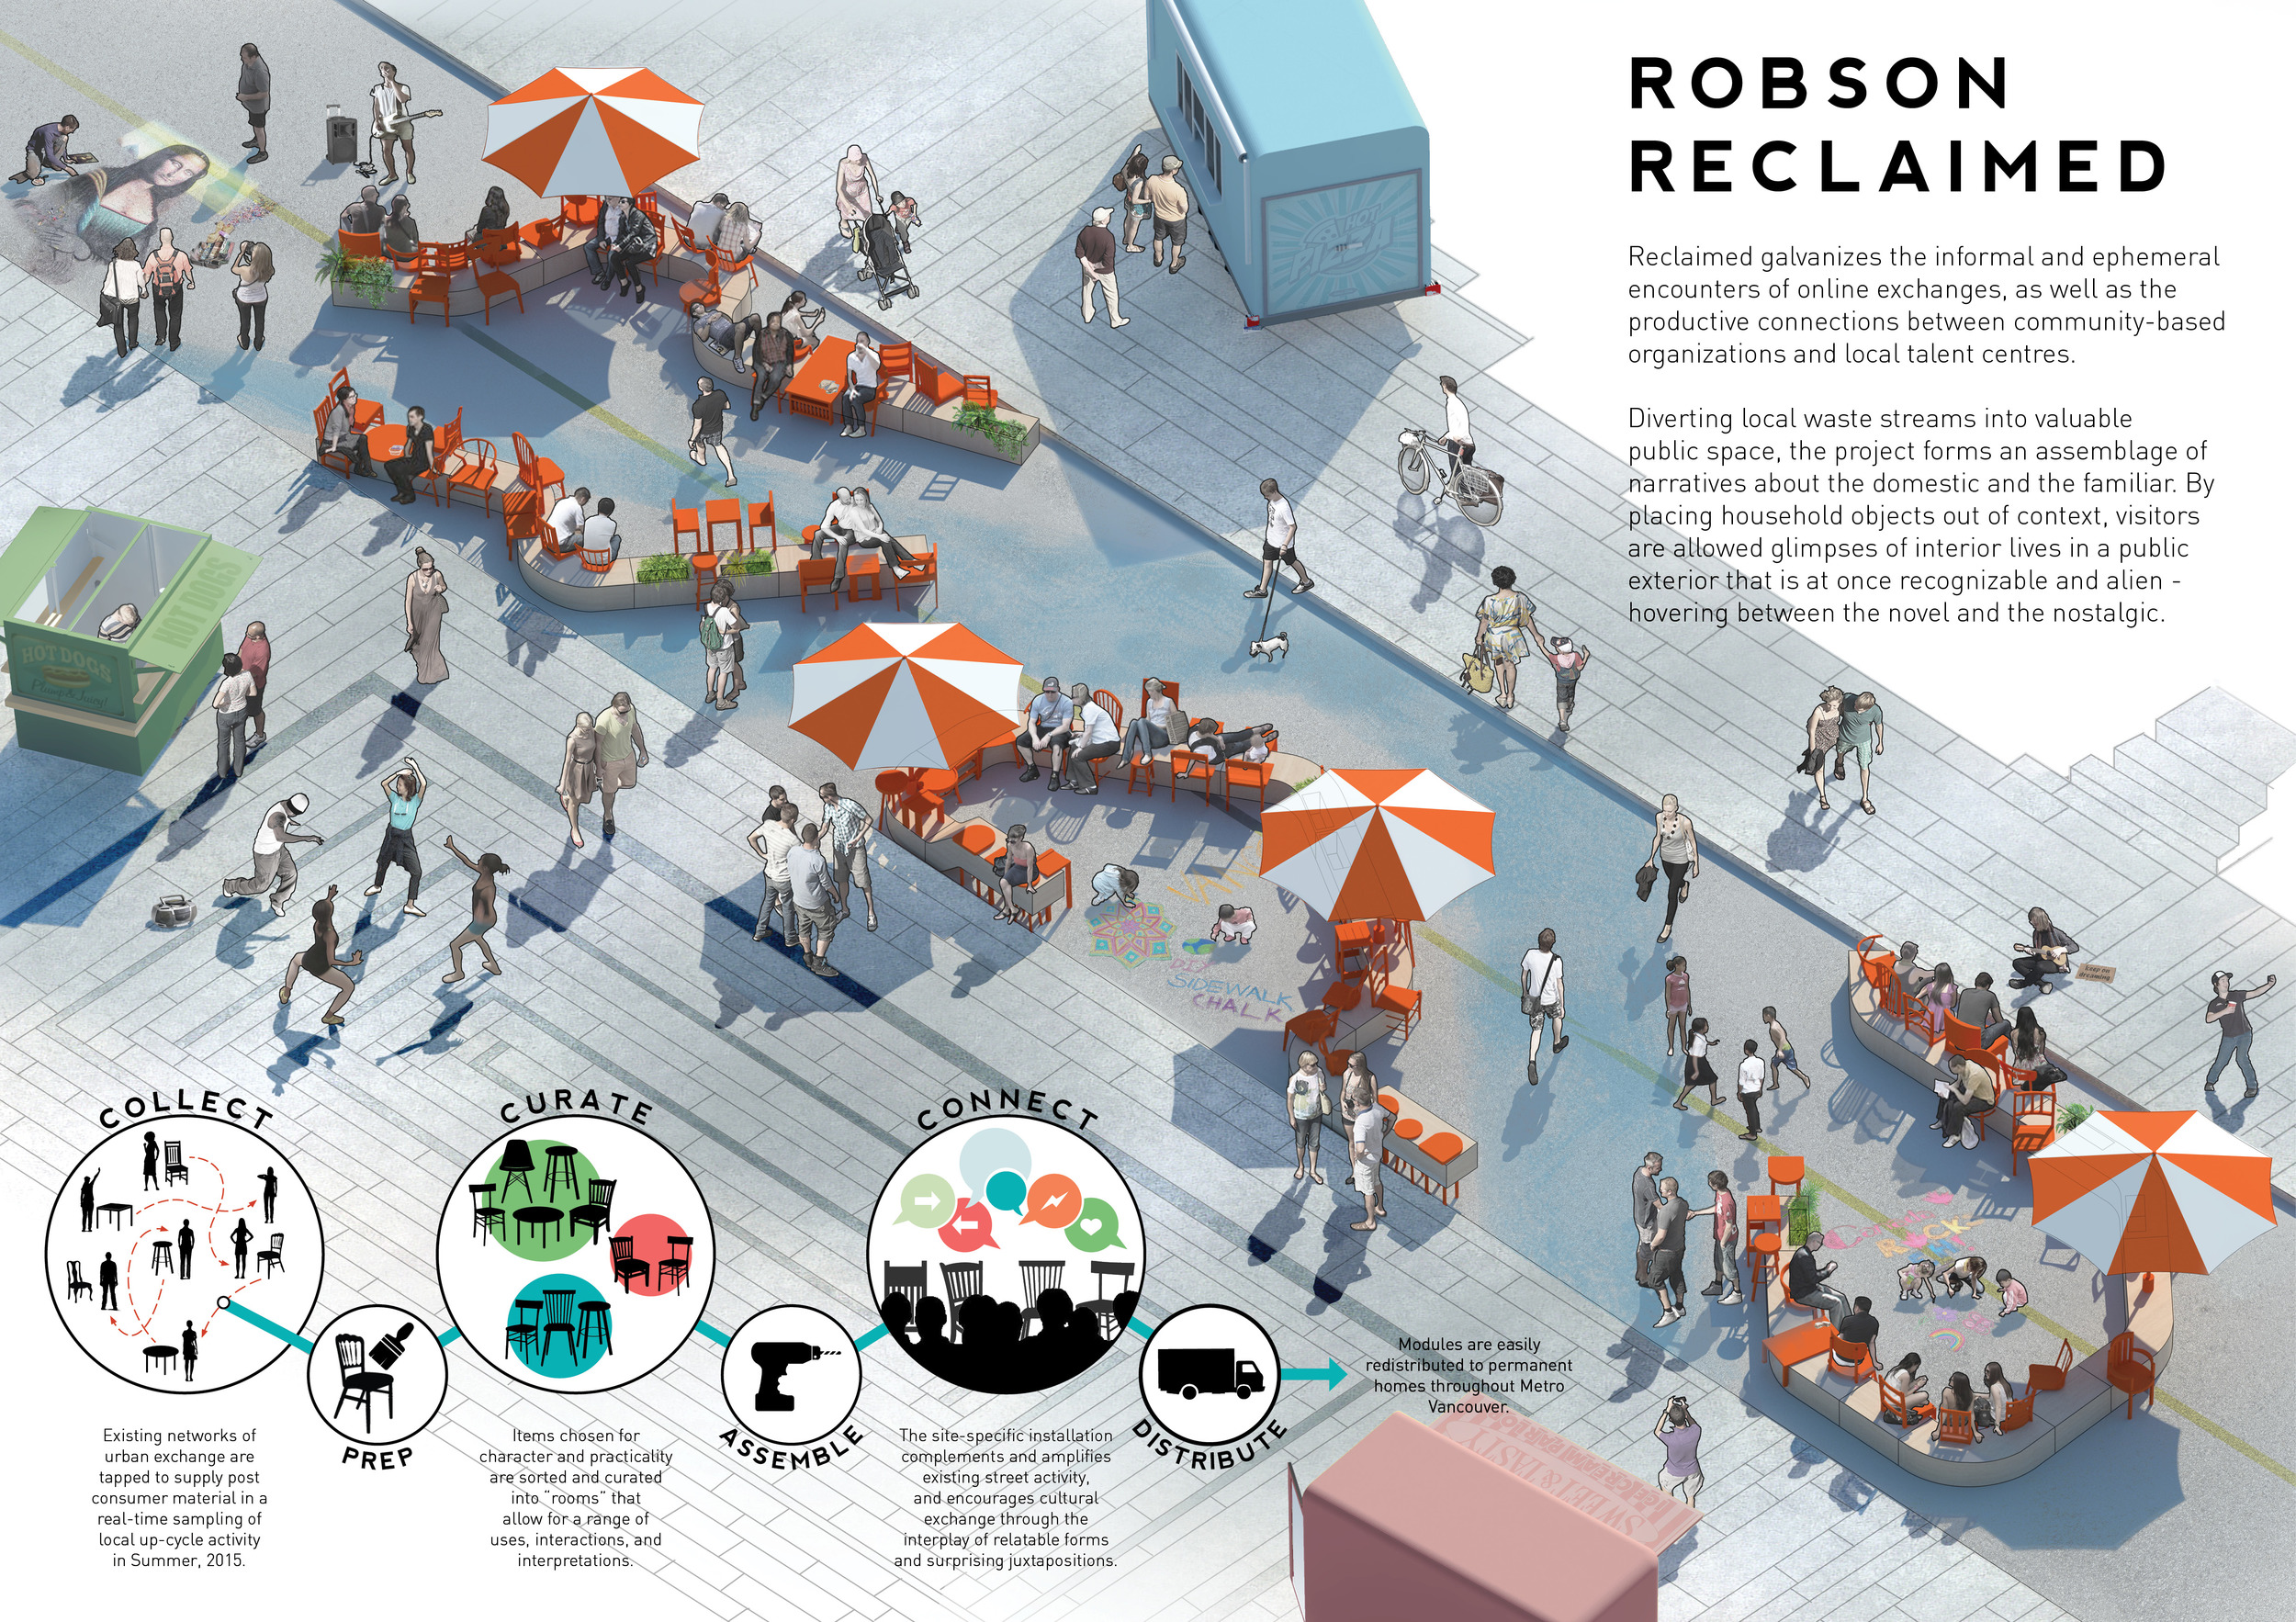 RobsonReclaimed-Board2a.jpg